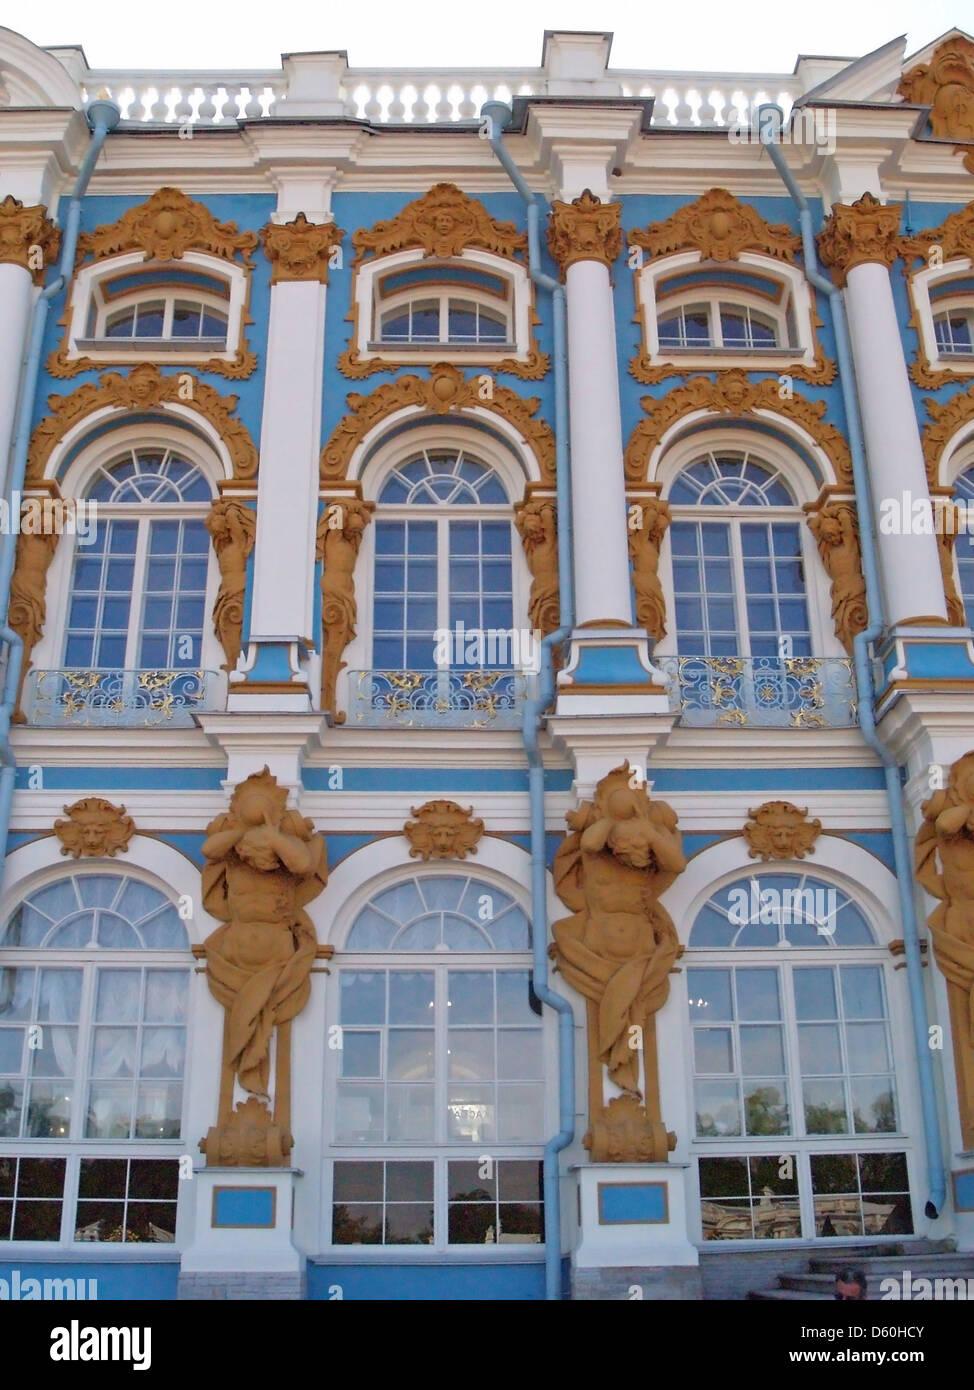 The facade of Catherine Palace,Tsarskoe Selo,Pushkin - Stock Image